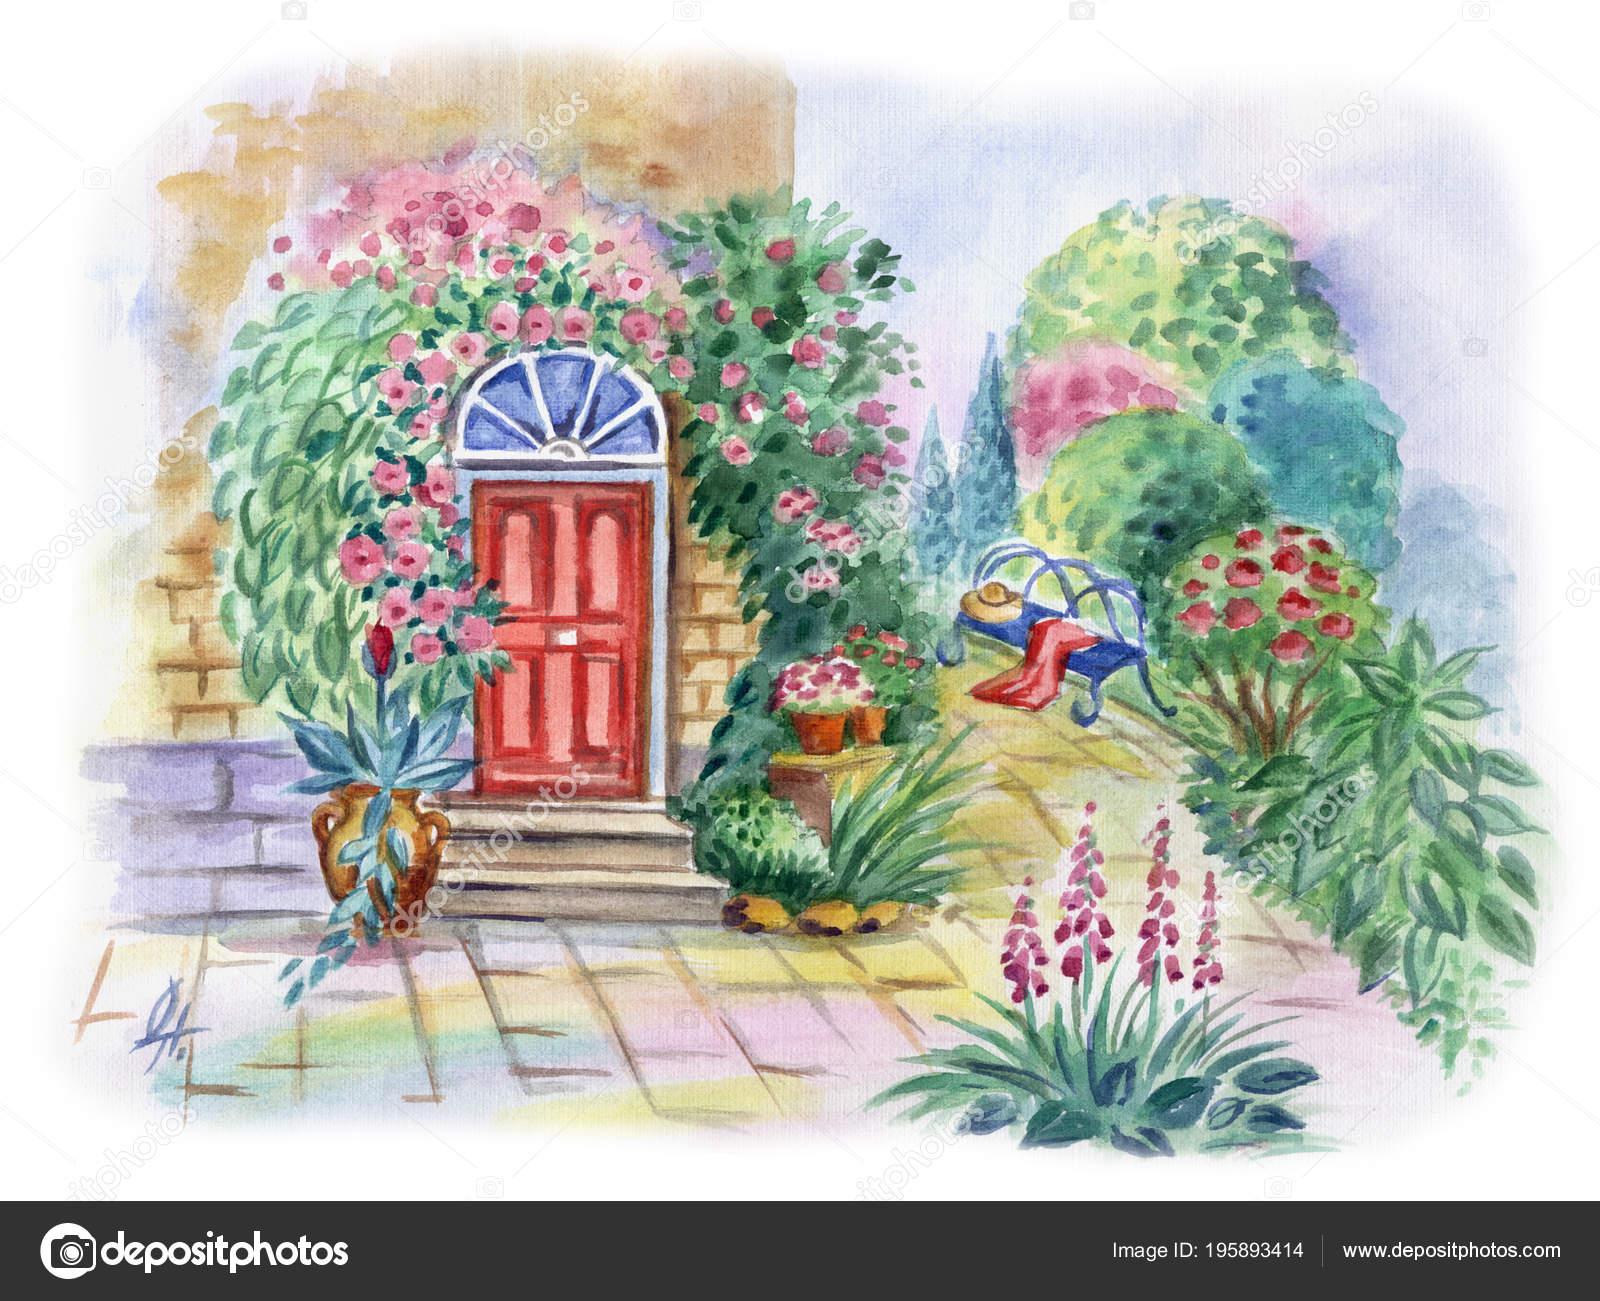 Pohled Kvetouci Predzahradka Dum Dvere Zahrady Lavice Akvarel